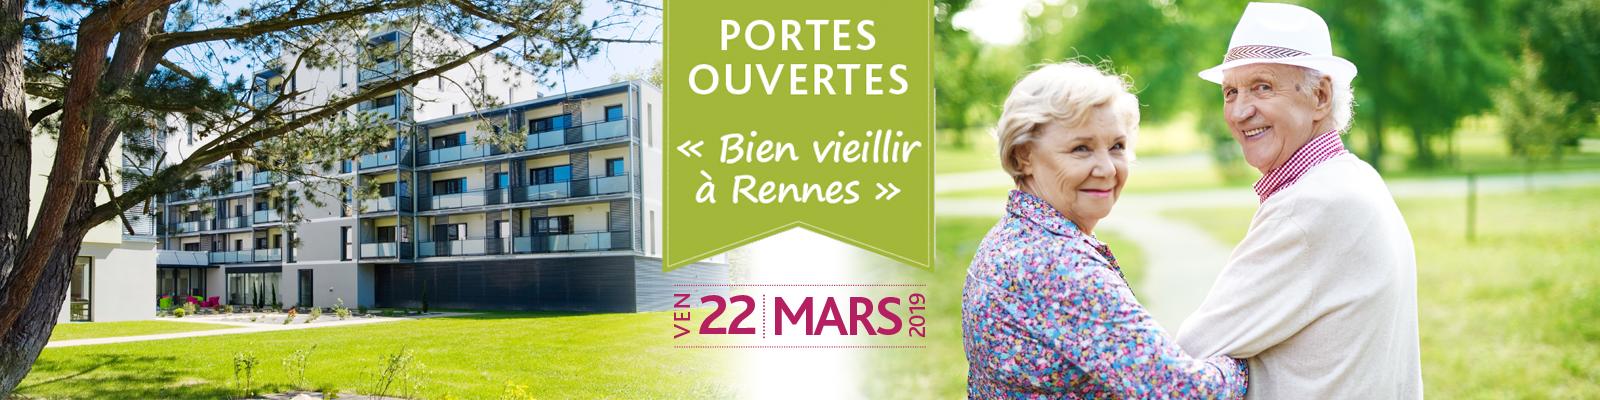 forum rencontre gay organization à Rennes